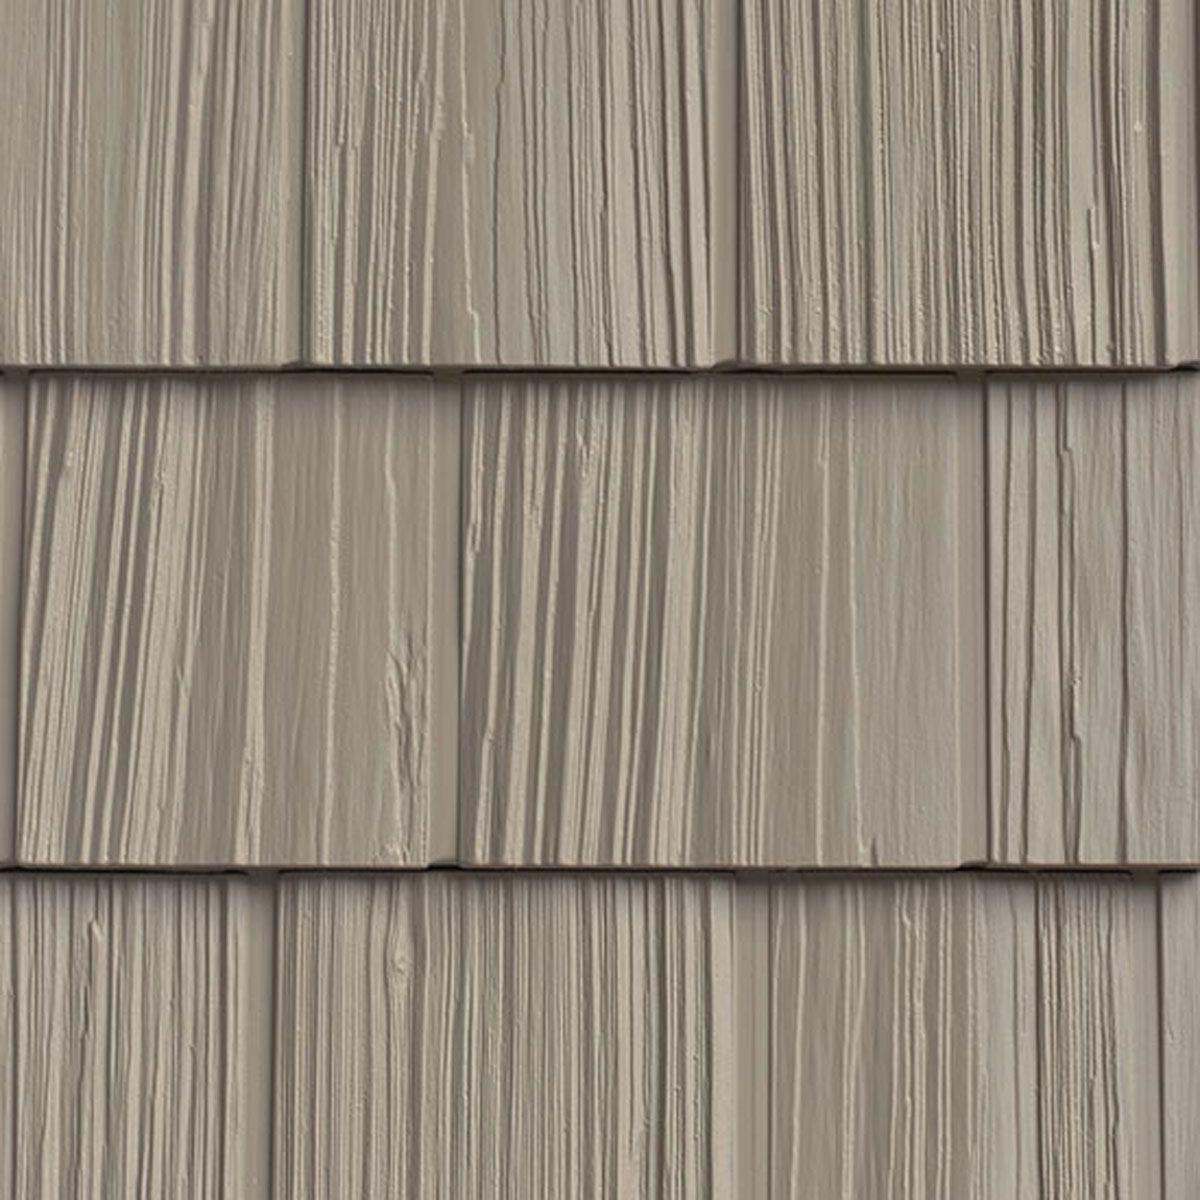 10 Inch W X 62 1 2 Inch L Exposure Vinyl Staggered Shakes 23 Panels Ctn 100 Sq Feet Vinyl Siding Vinyl Shake Siding Shake Siding